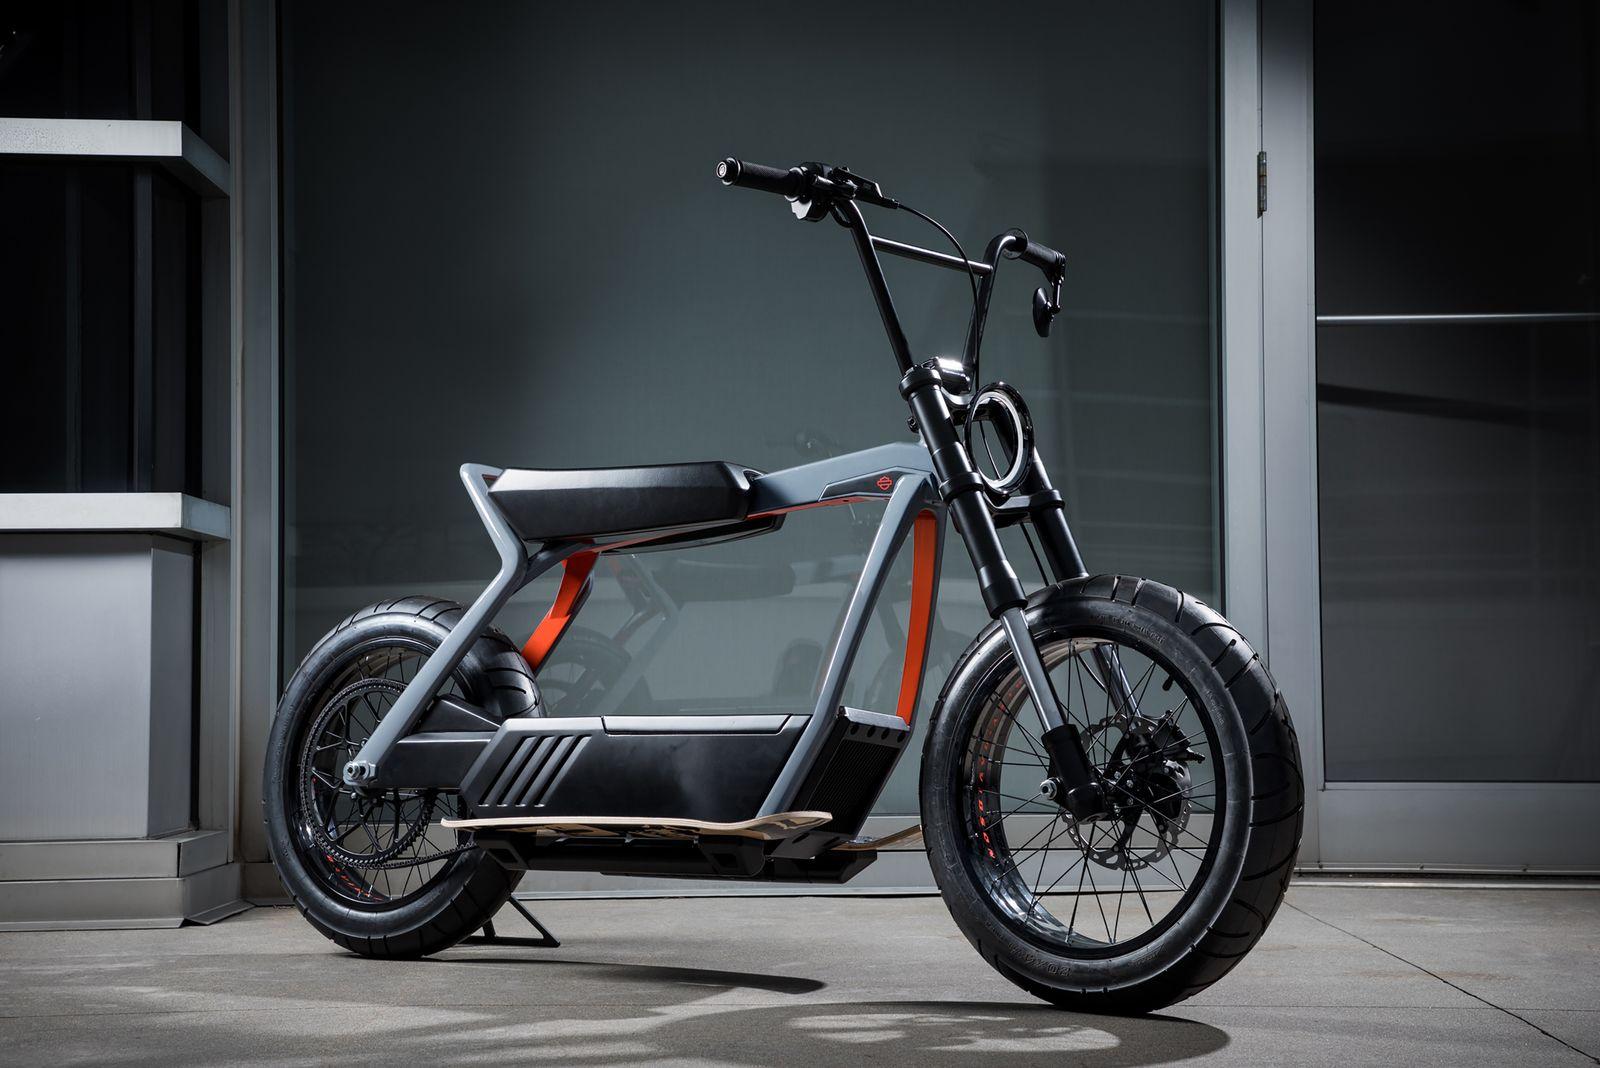 Prototyp Harley-Davidson Roller